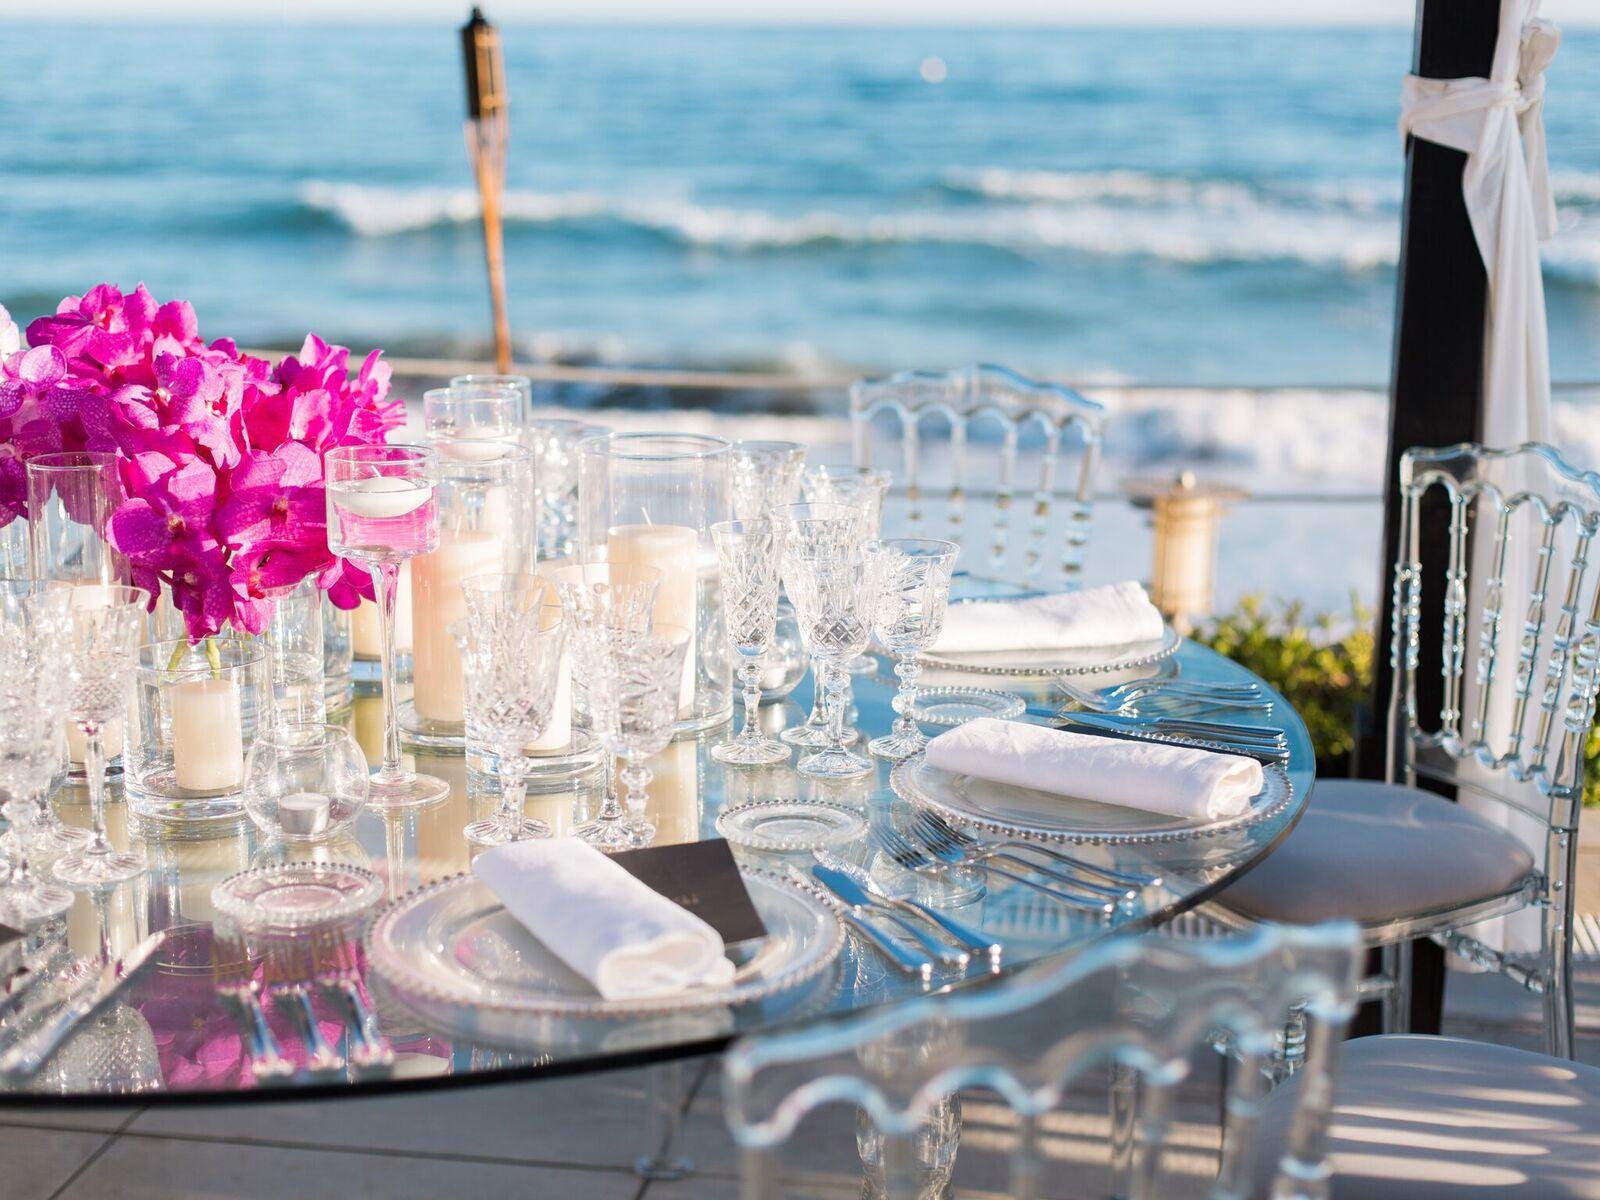 Si-Quiero-Wedding-Planner-Sira-Antequera-N-M-011